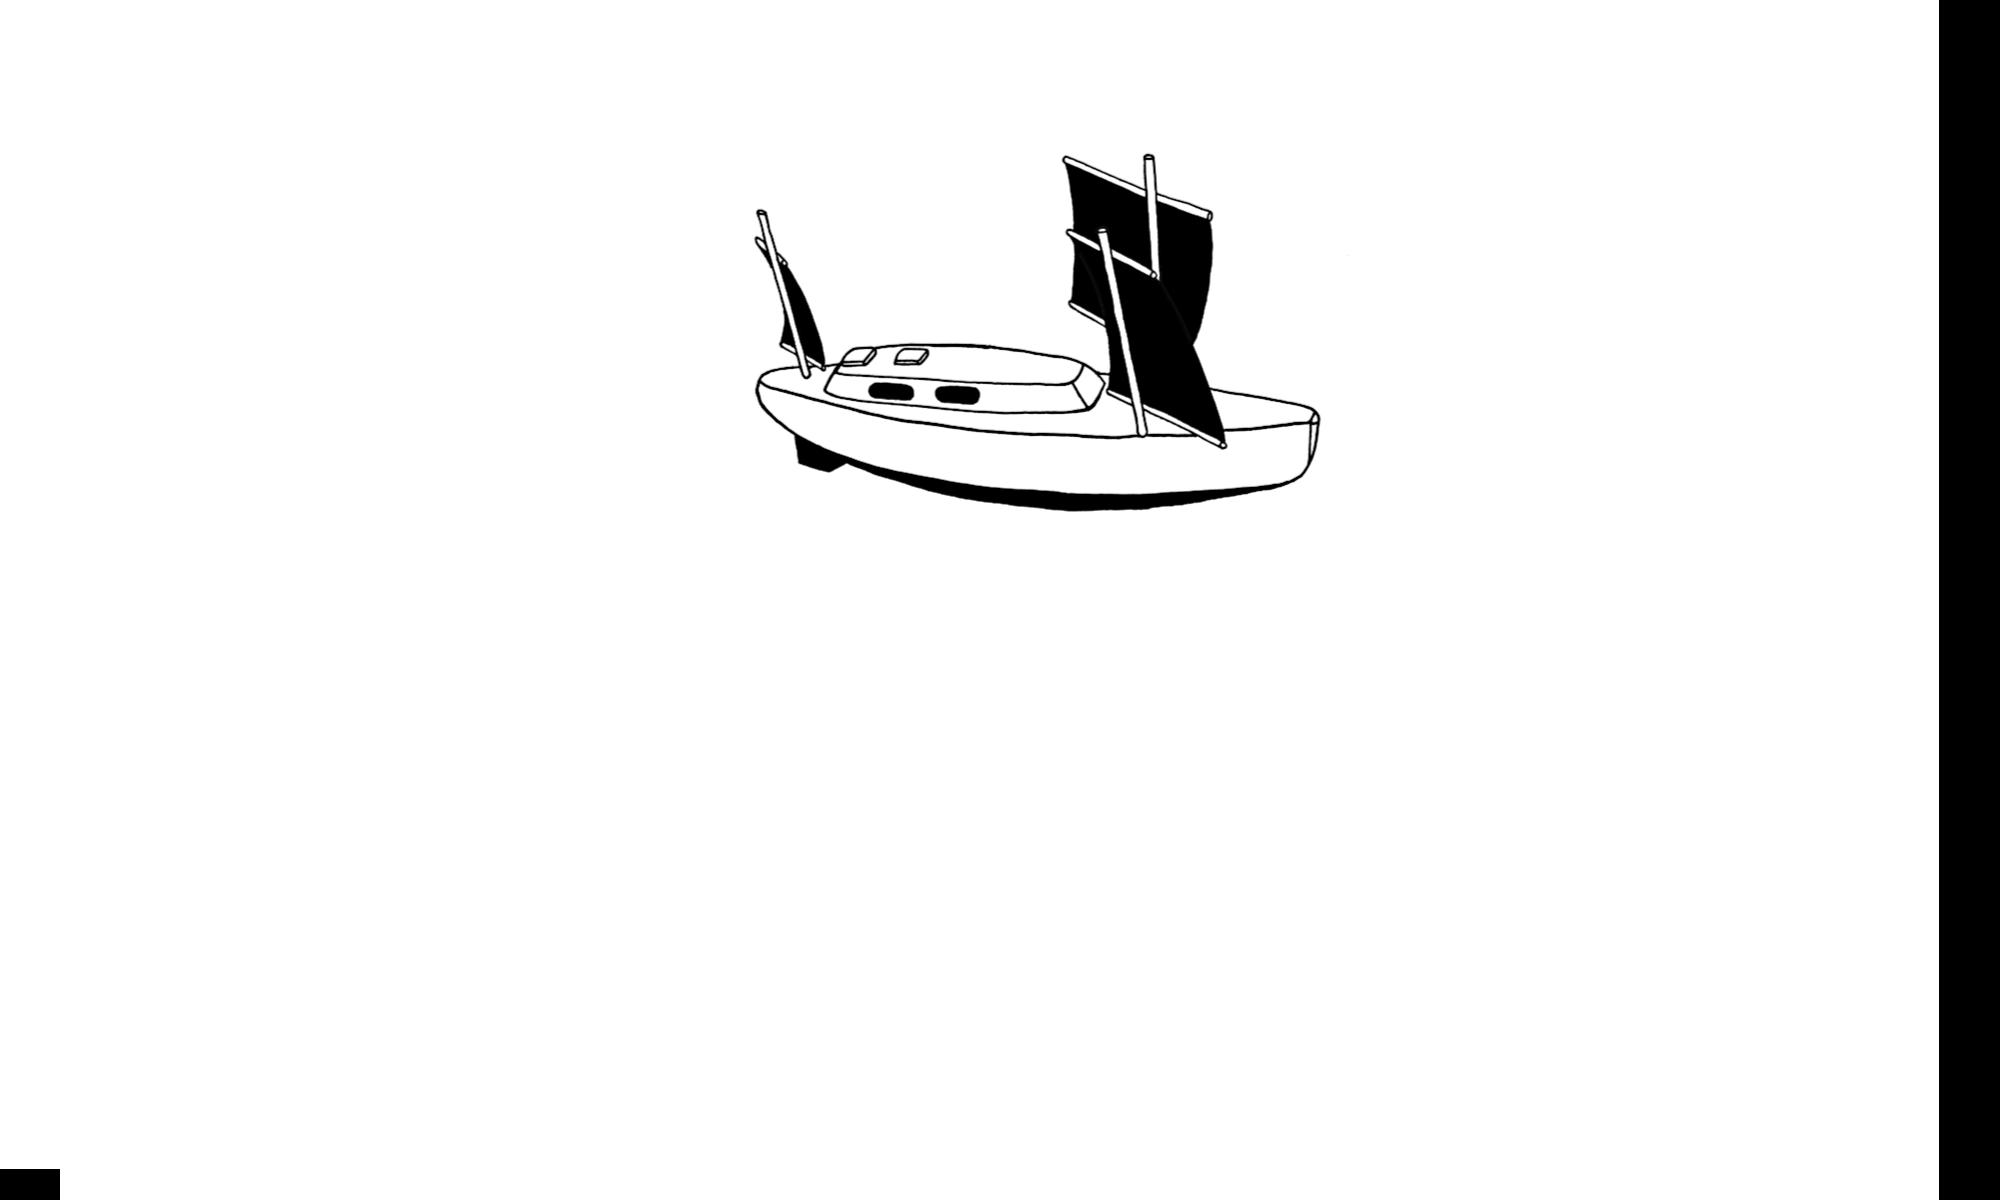 Simple habits, simple boat